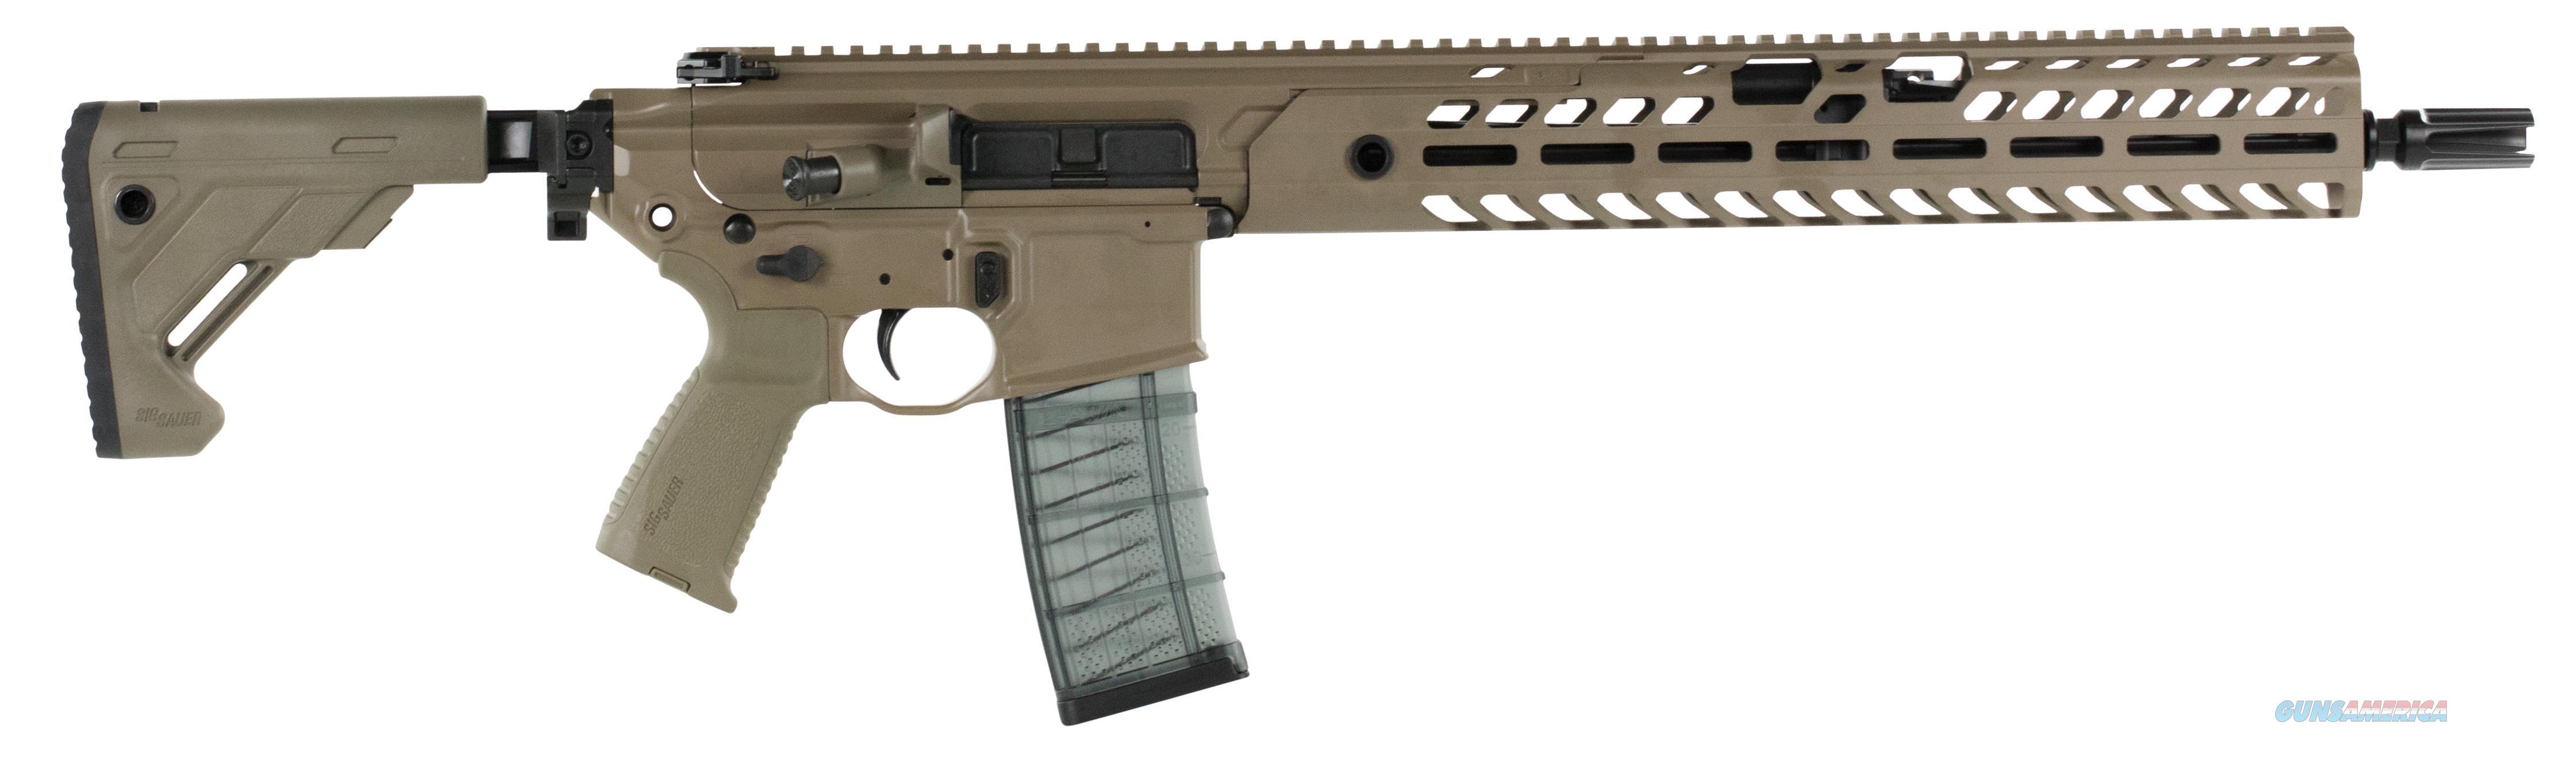 "Sig Sauer Mcx 5.56 16"" 30Rd RMCX-16B-TAP-P-FDE  Guns > Rifles > S Misc Rifles"